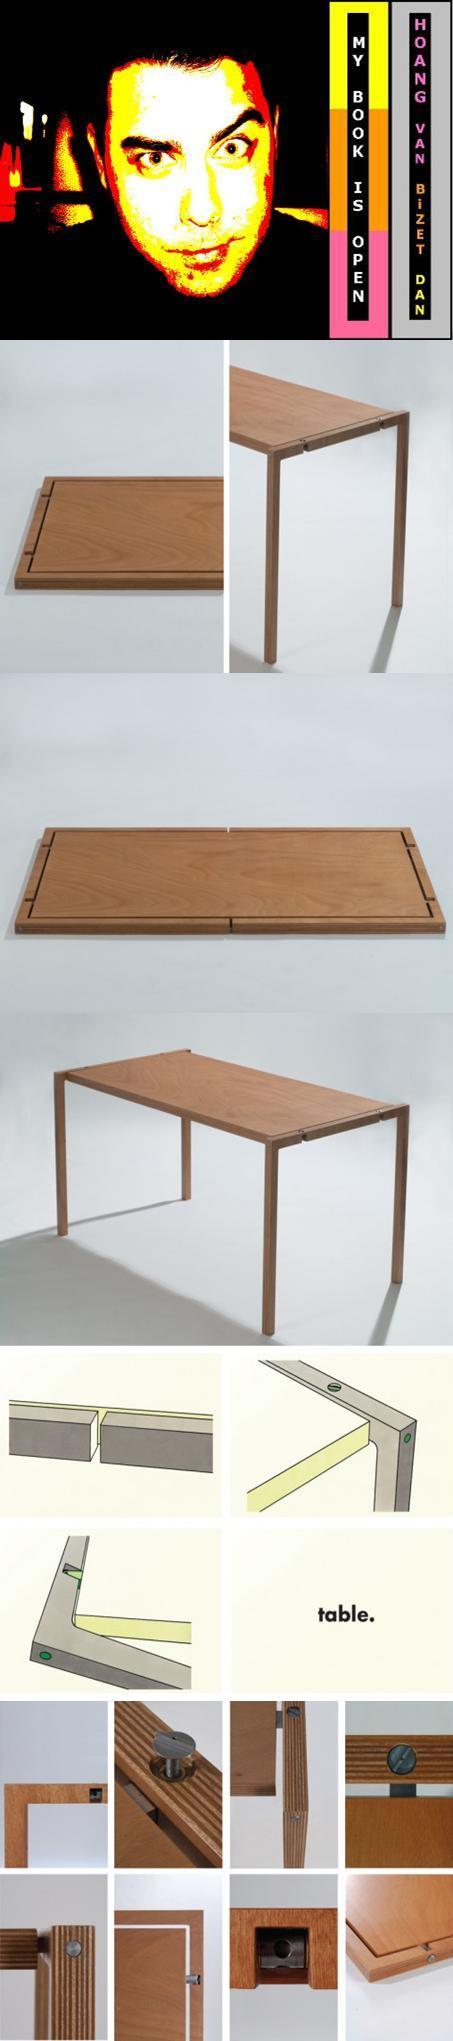 Minimalist Folding Table By Lodovico Bernardi